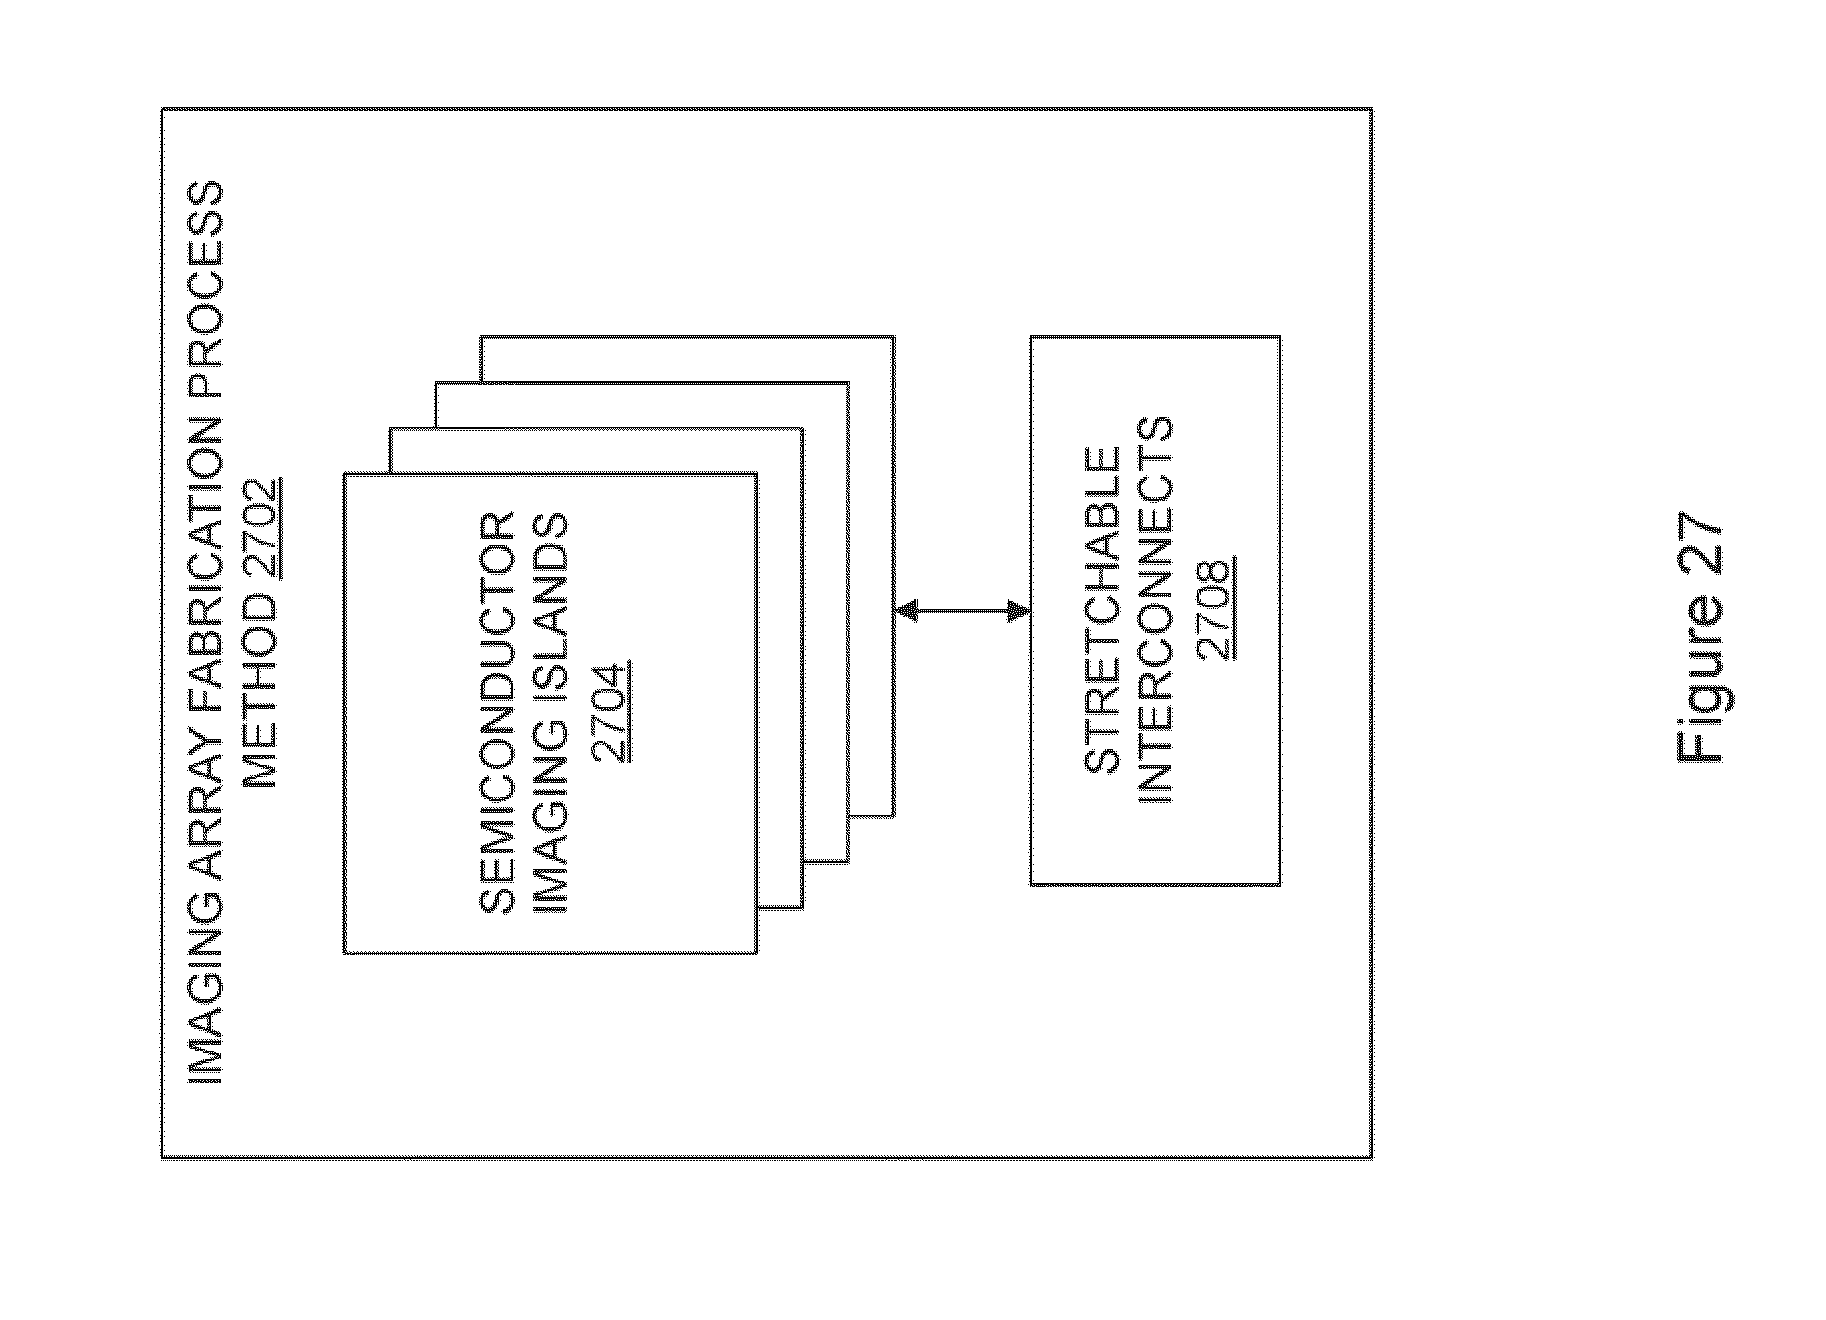 Idec Rssan 50a Wiring Diagram